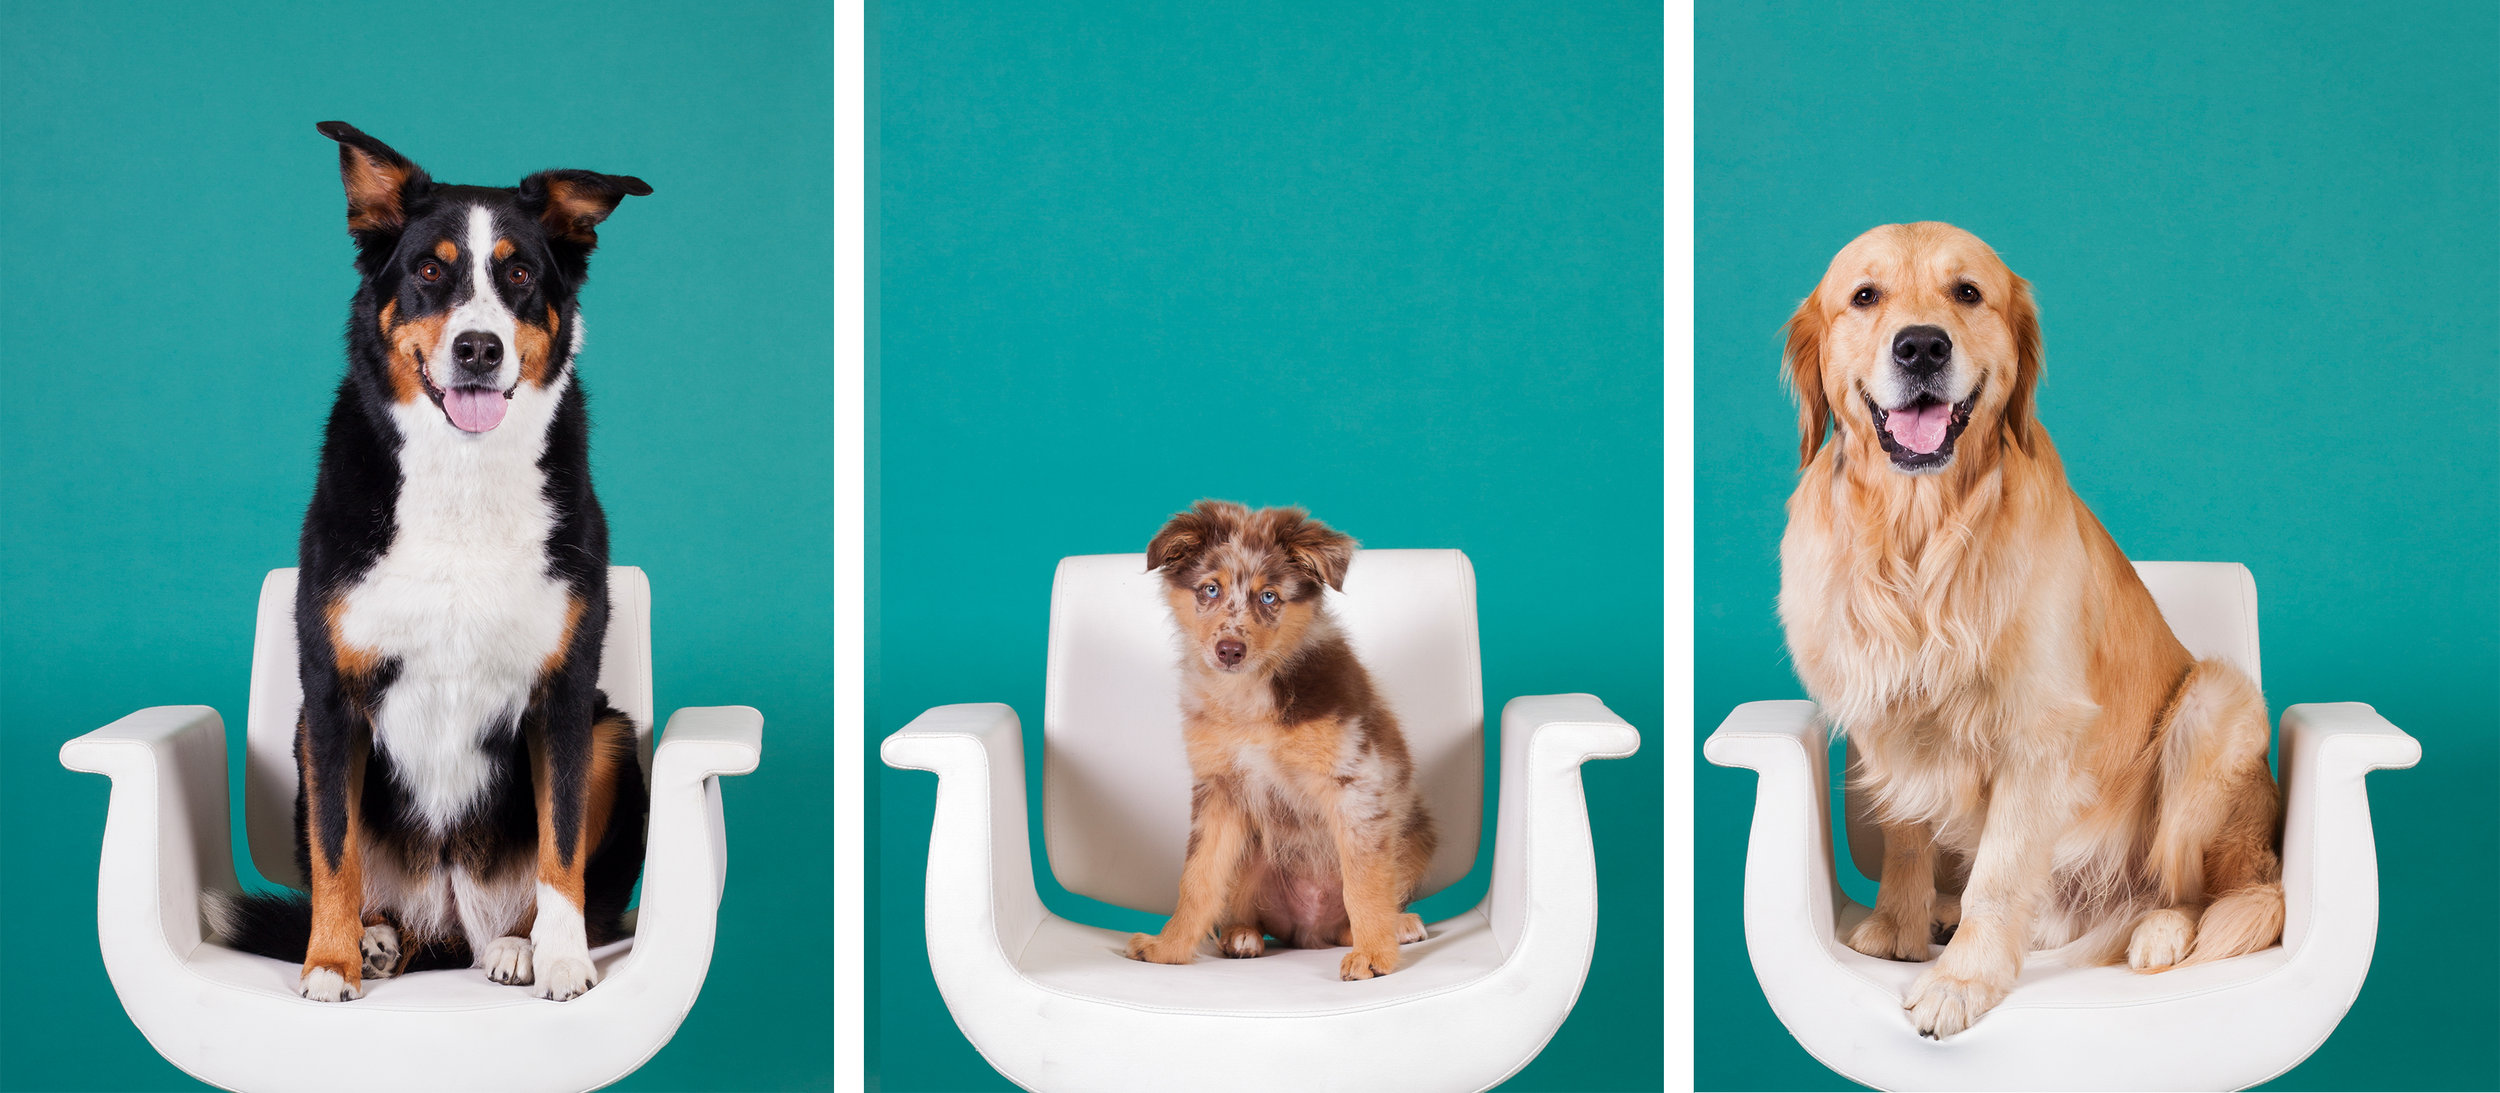 Darci's 3 dogs on chairs.jpg